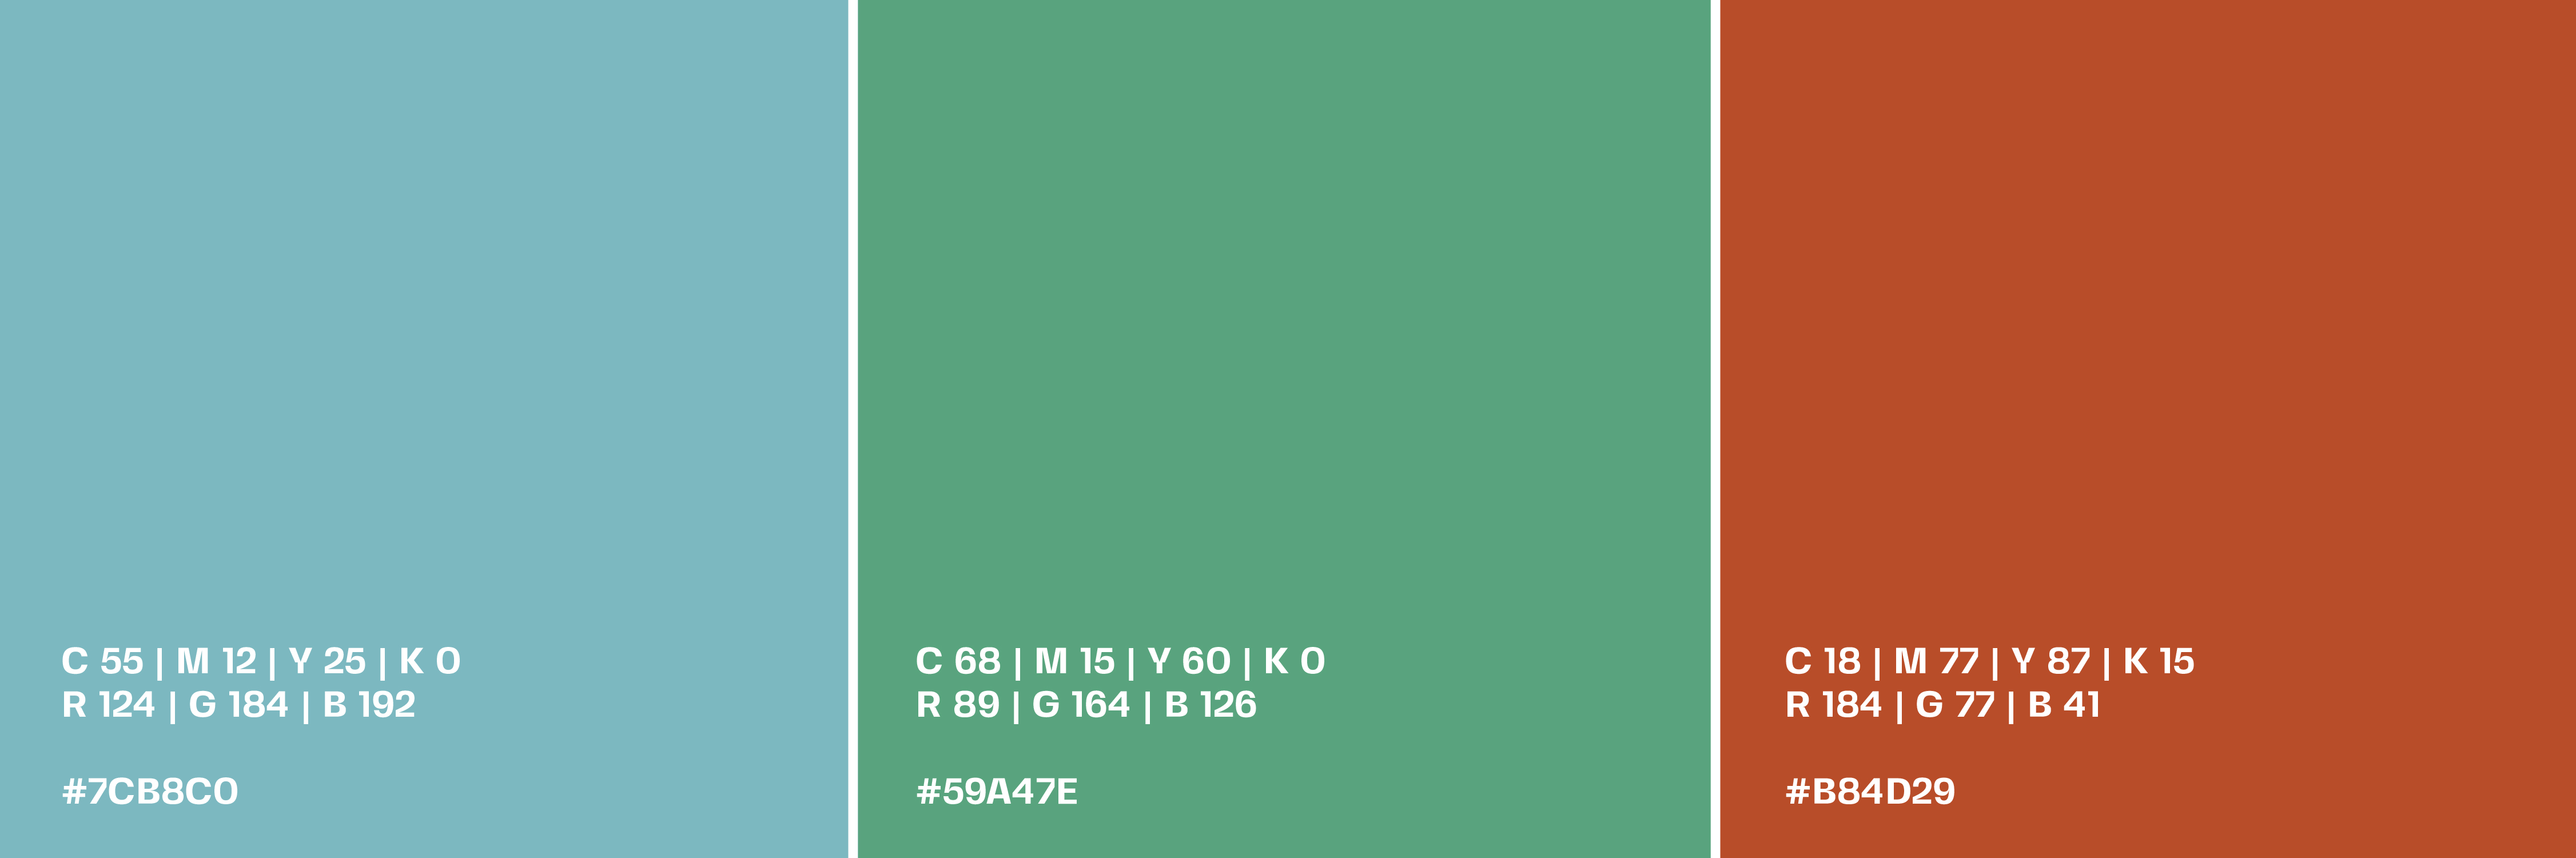 type-cromie-04